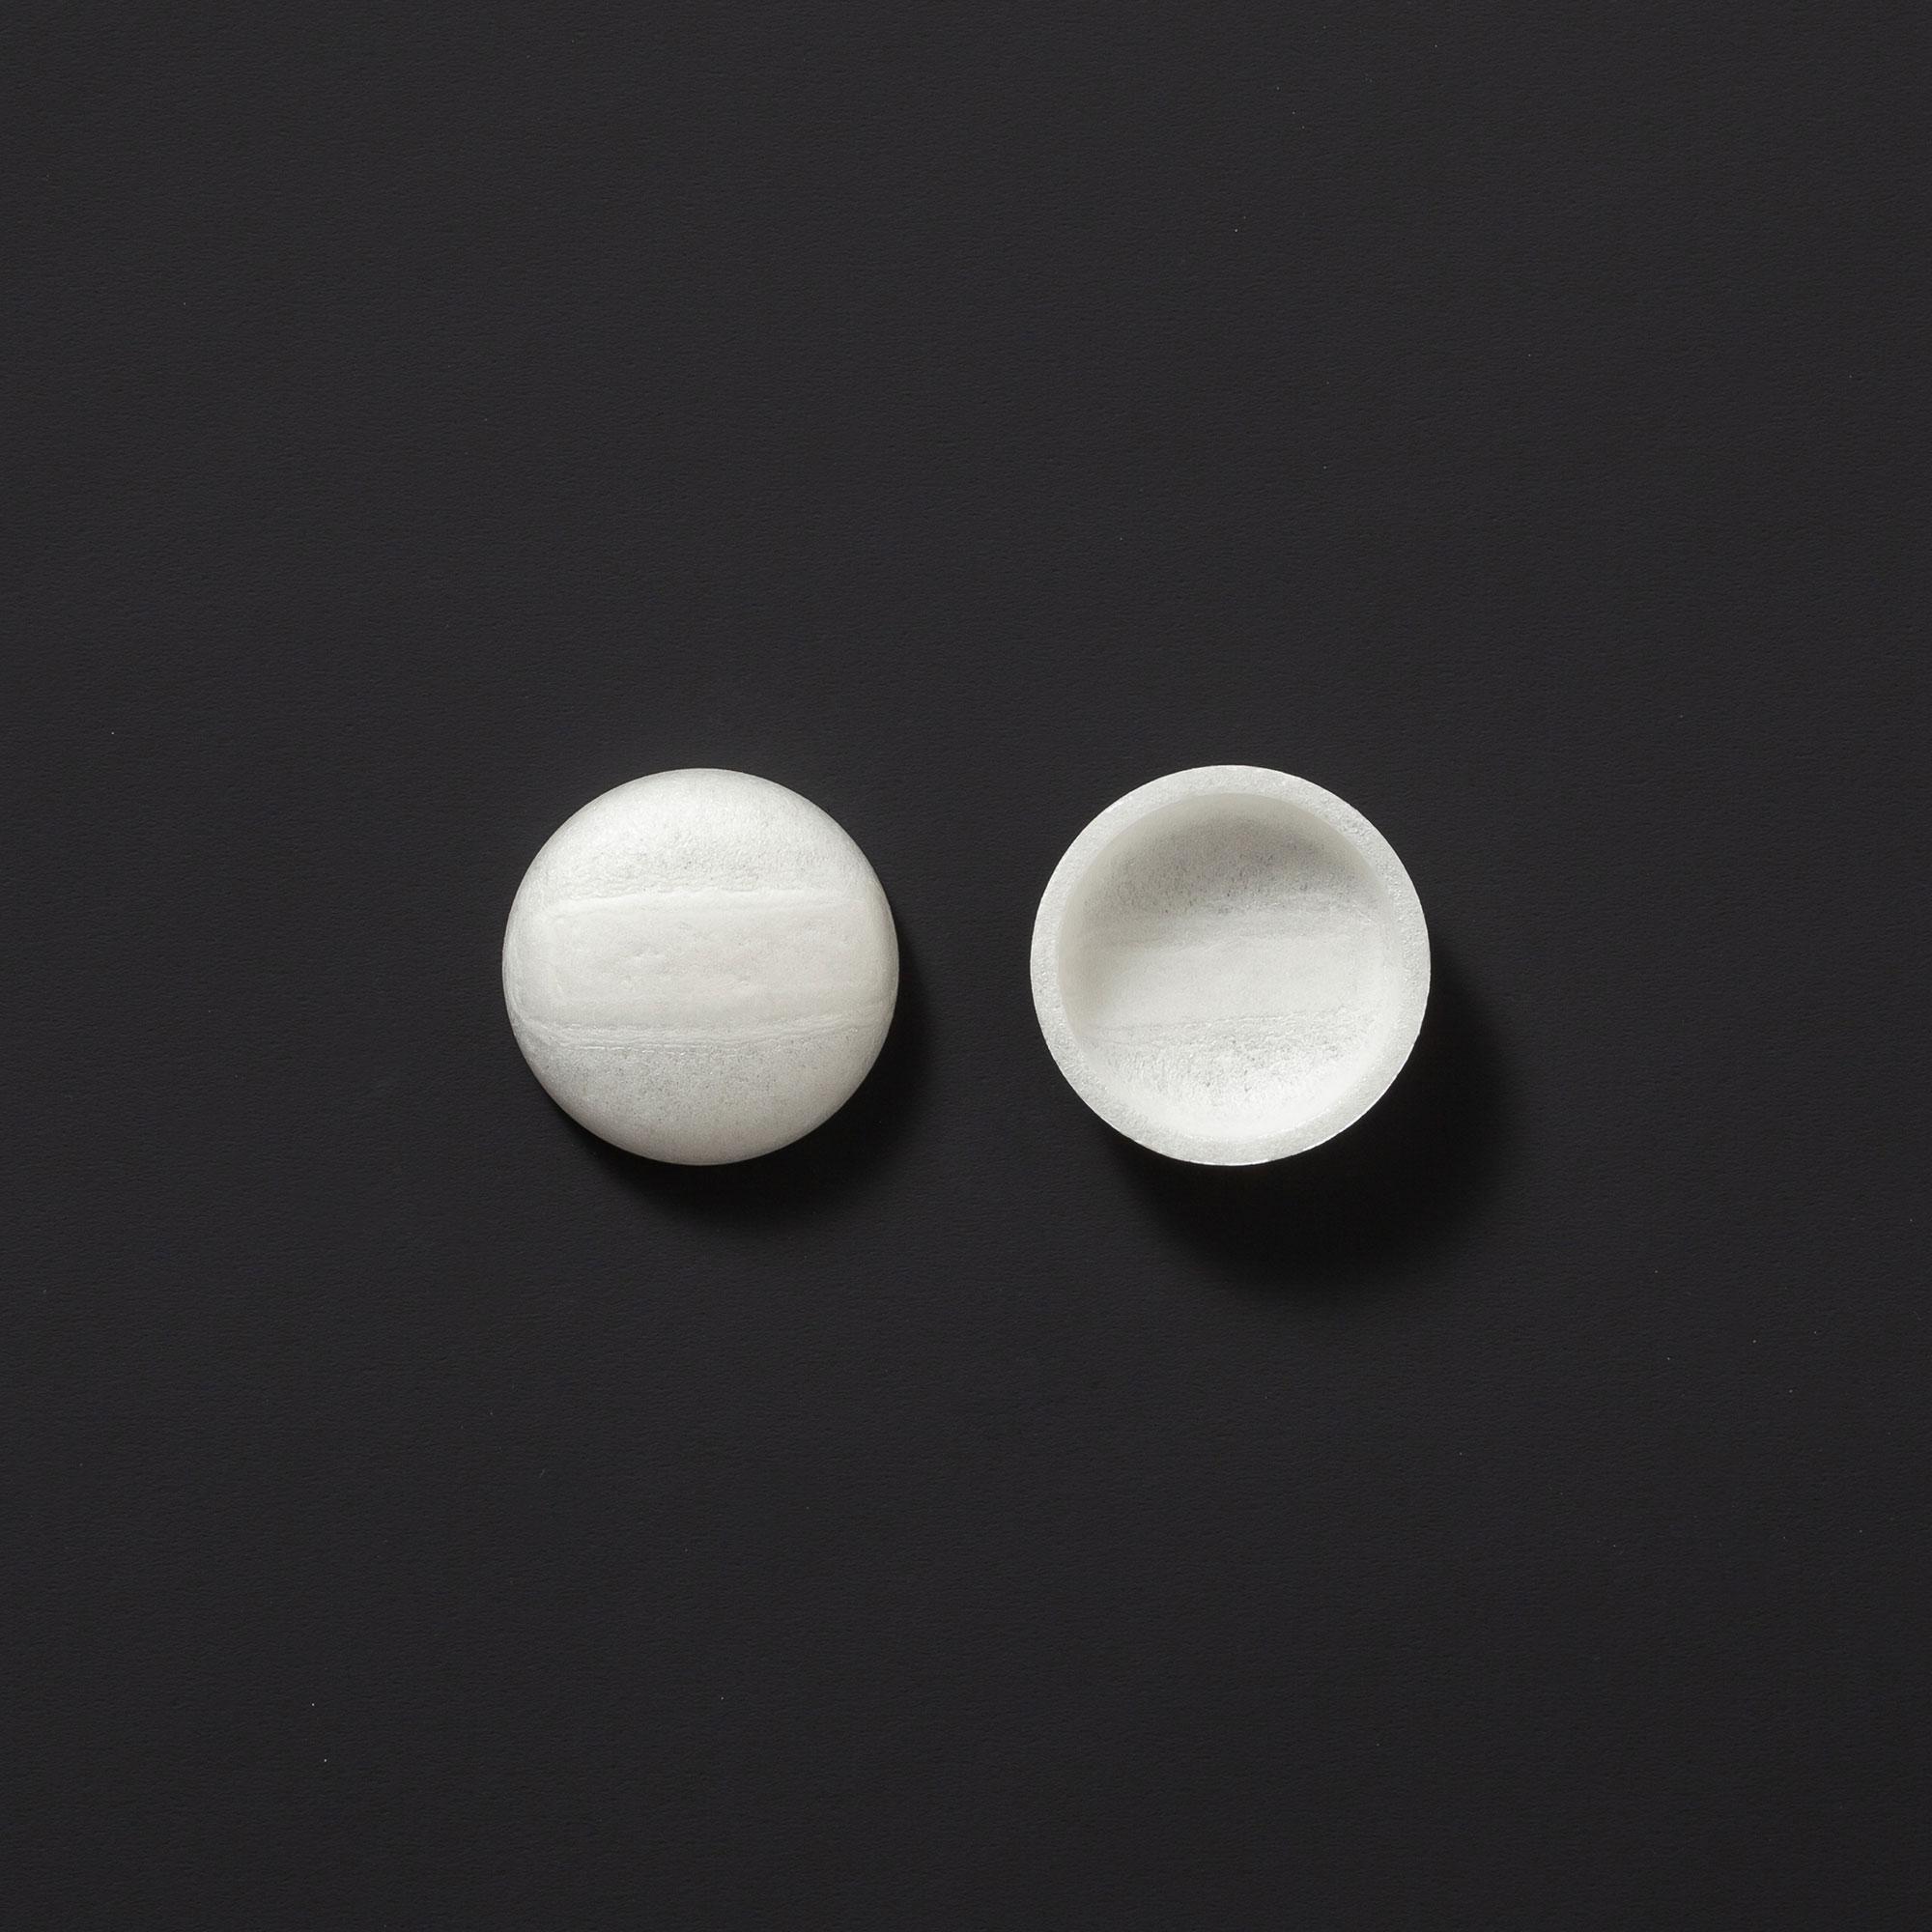 [A034] 塩もなか (能登塩使用)